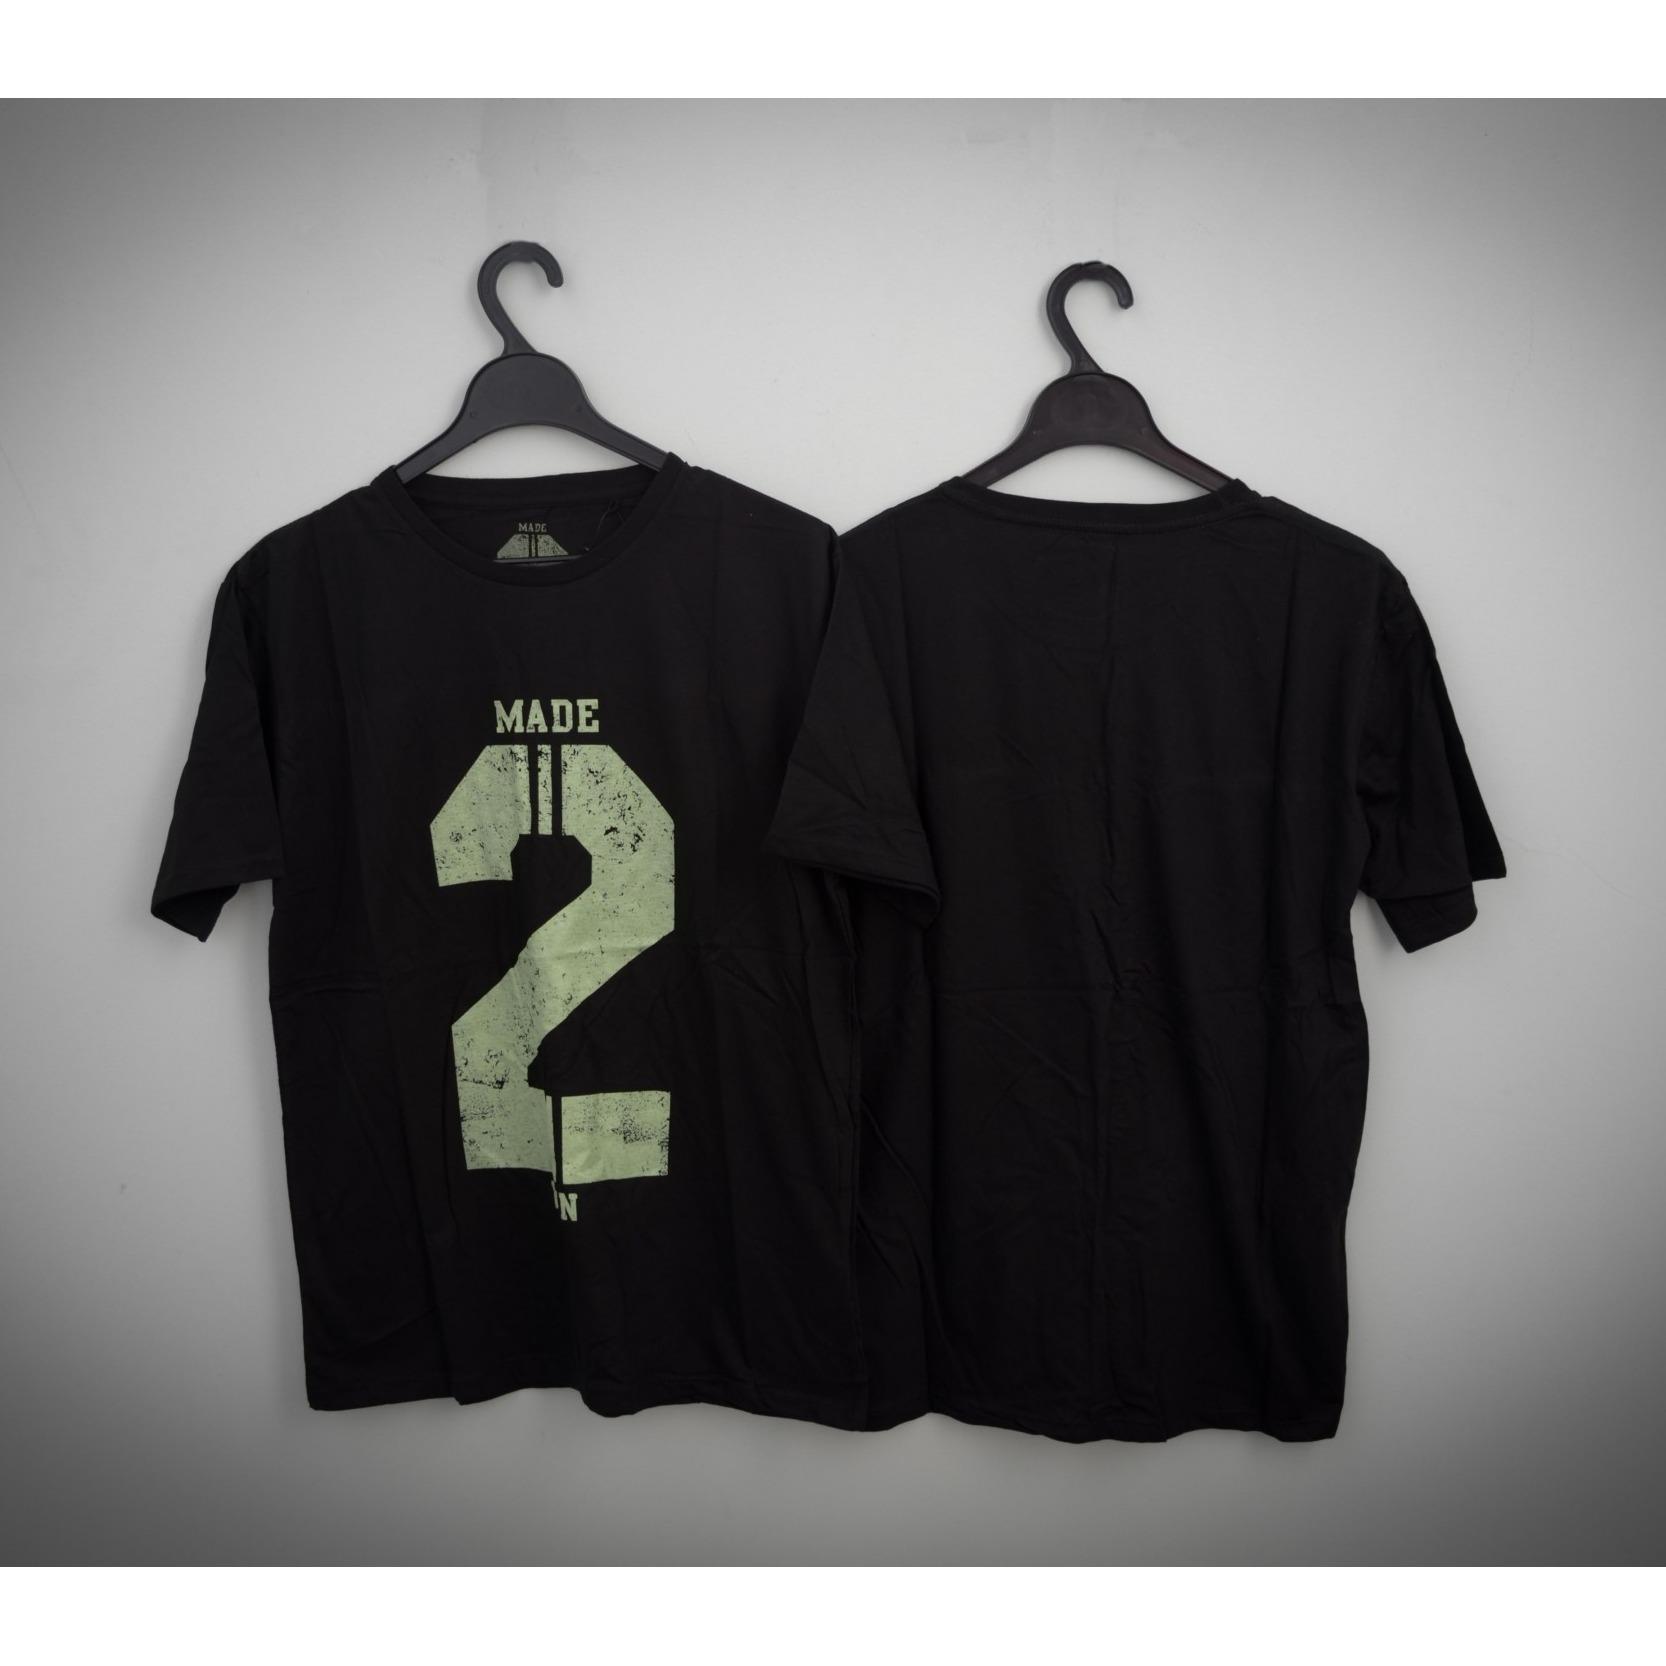 HIGH5 Fashion Pria Kaos Lengan Pendek MADE 2 WIN hitam